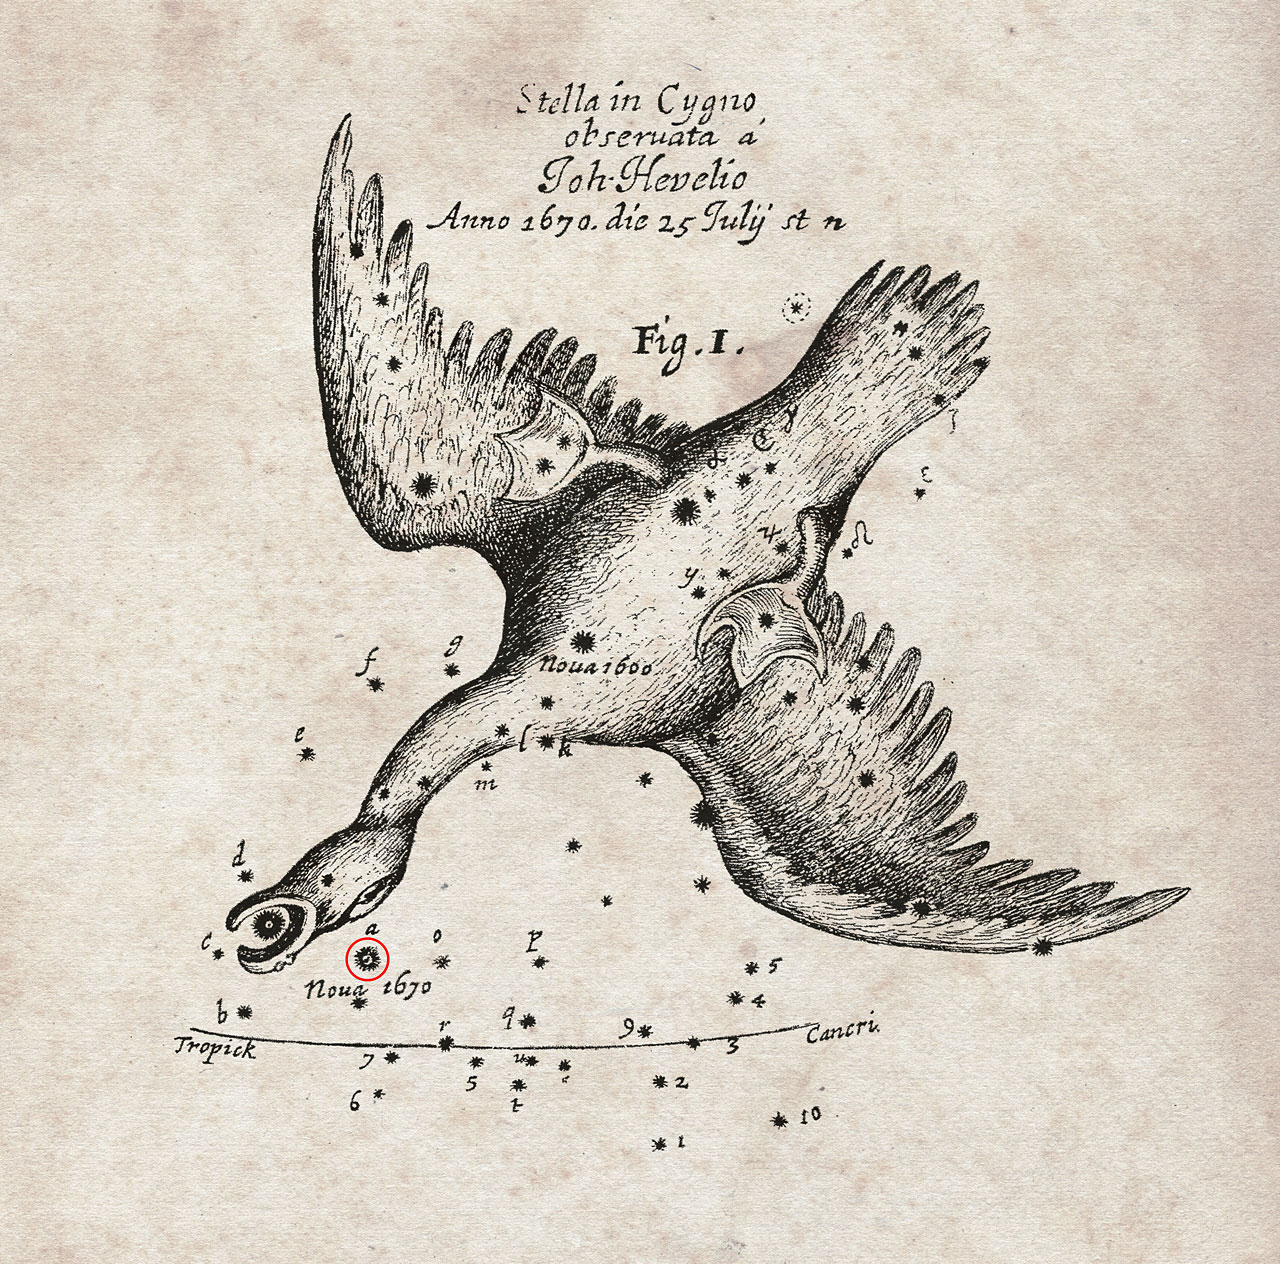 Nova Vulpeculae 1670